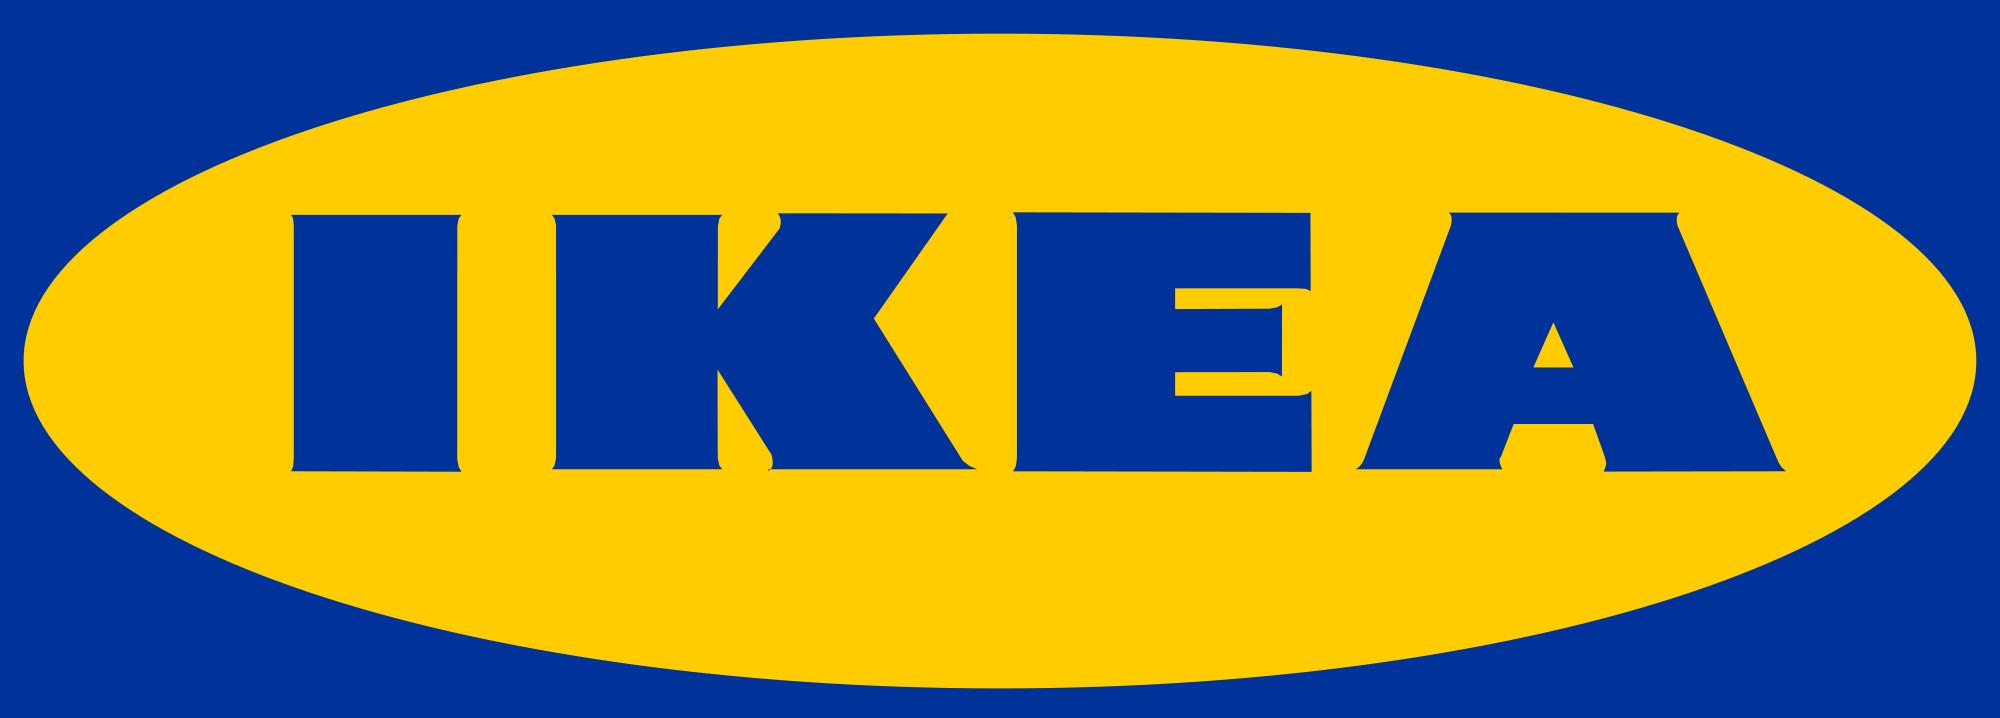 IKEA Cliënt Fort Advocaten